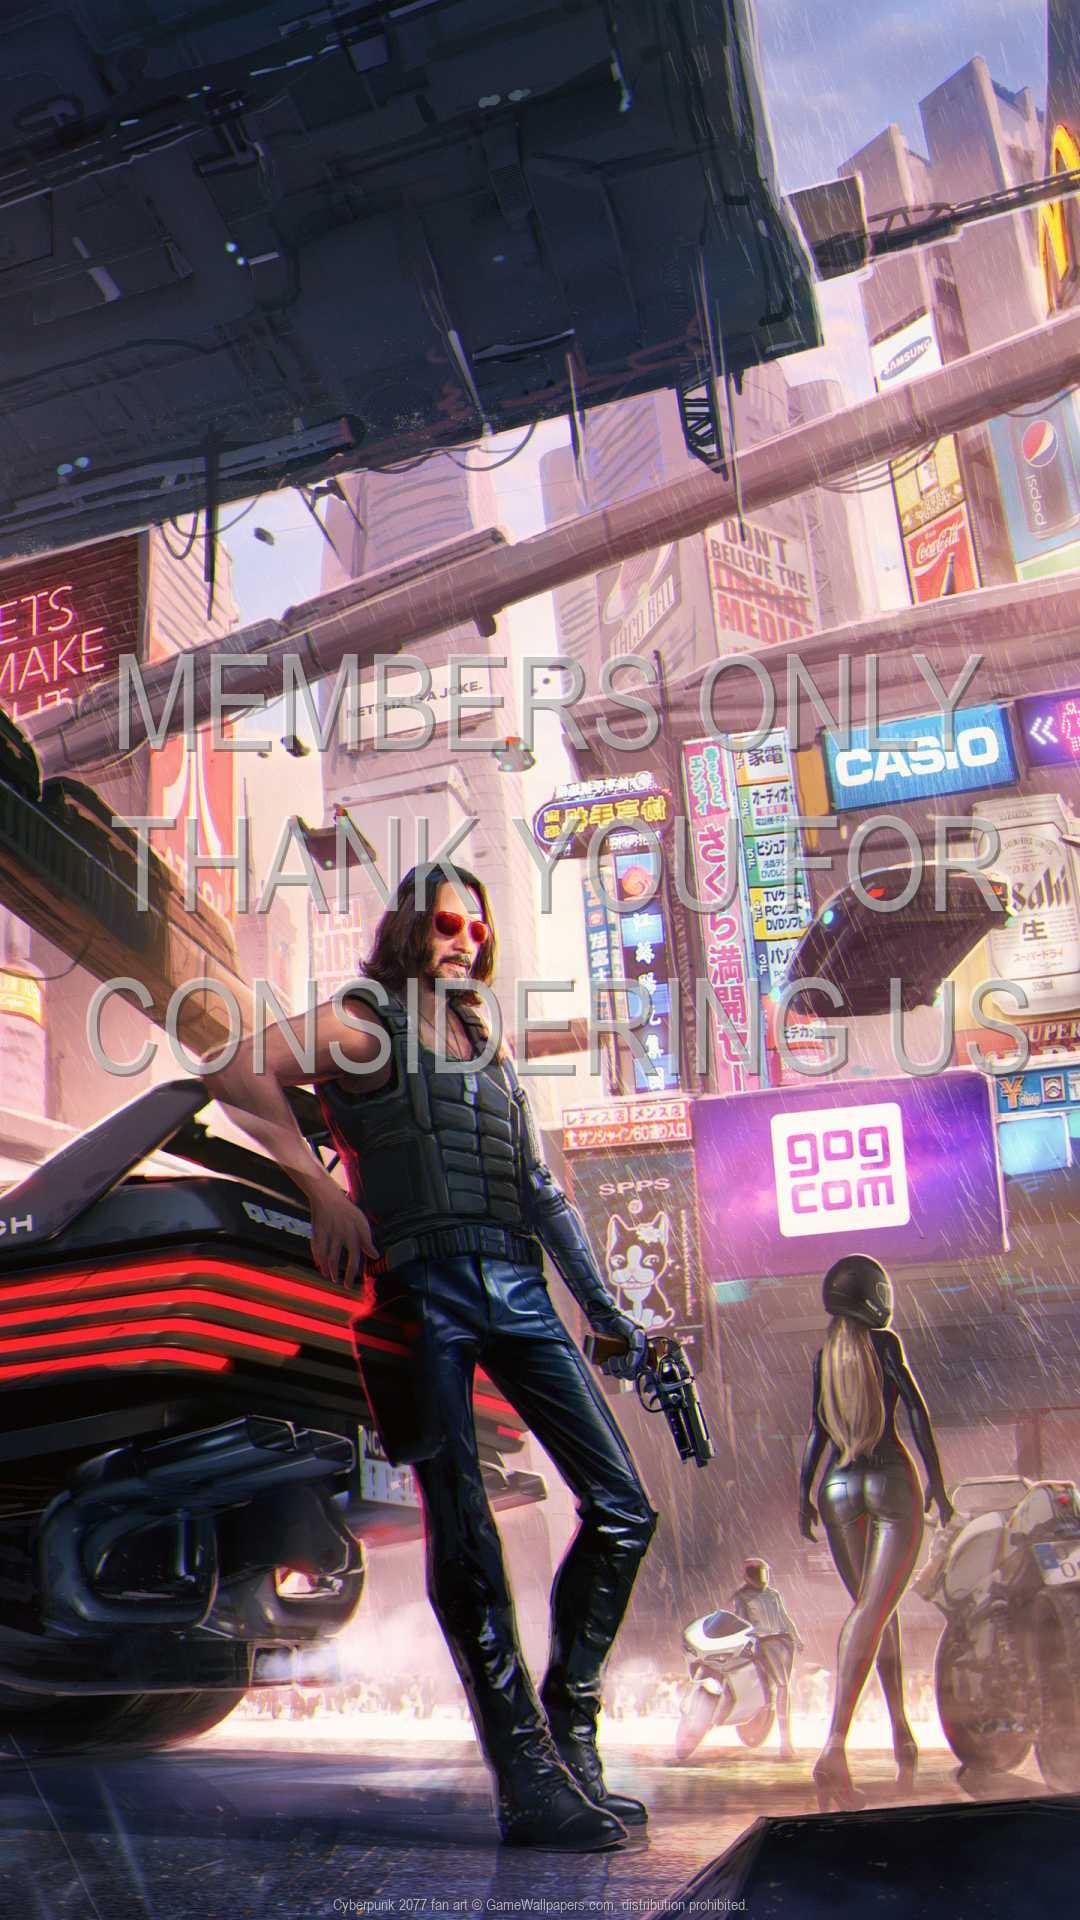 Cyberpunk 2077 fan art 1080p Vertical Mobile wallpaper or background 04